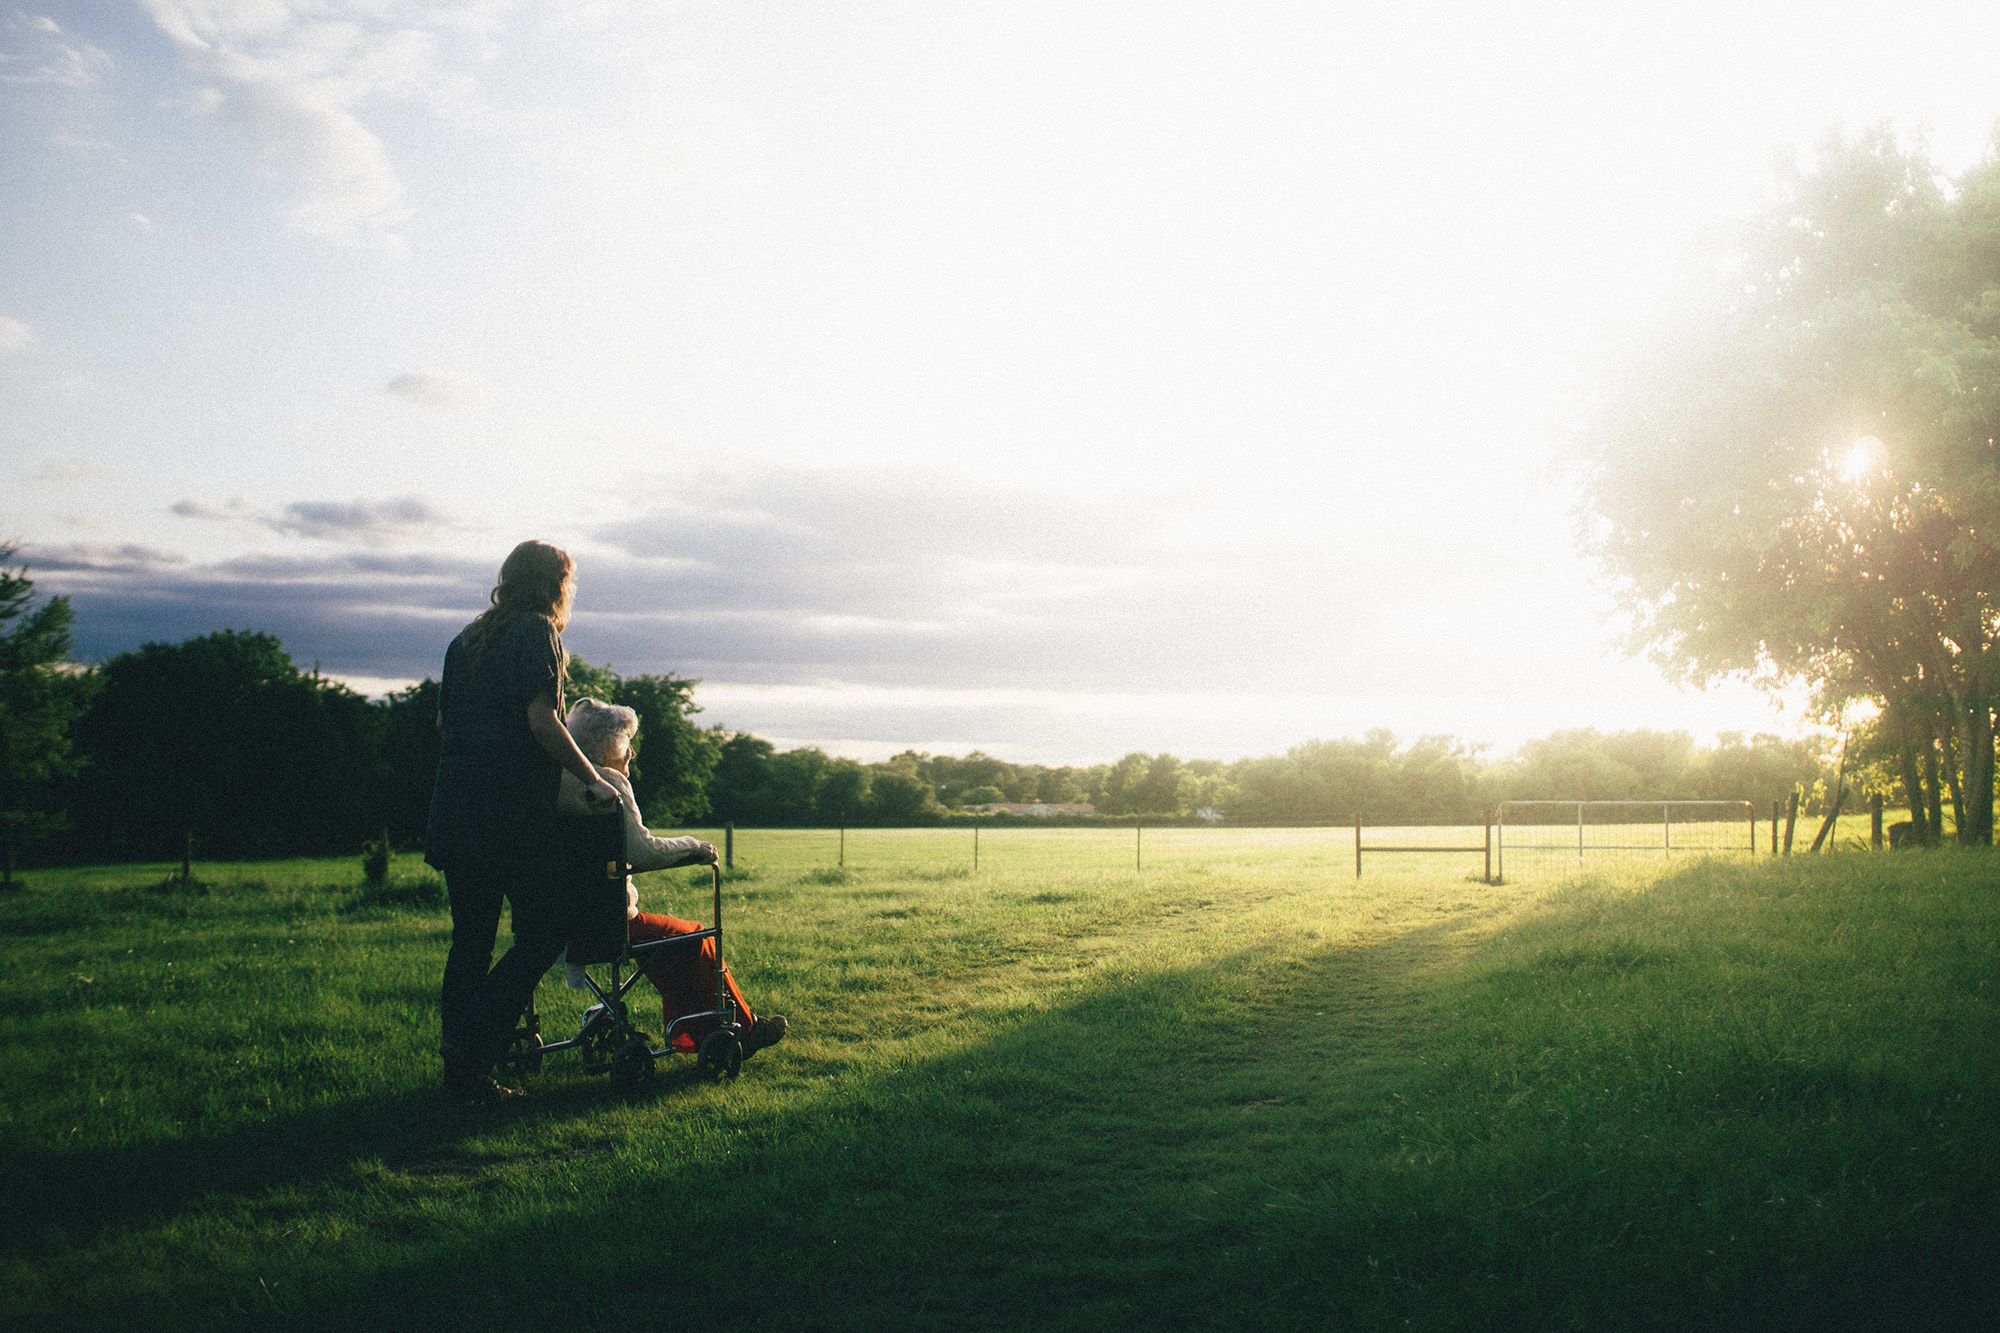 image of carer in field